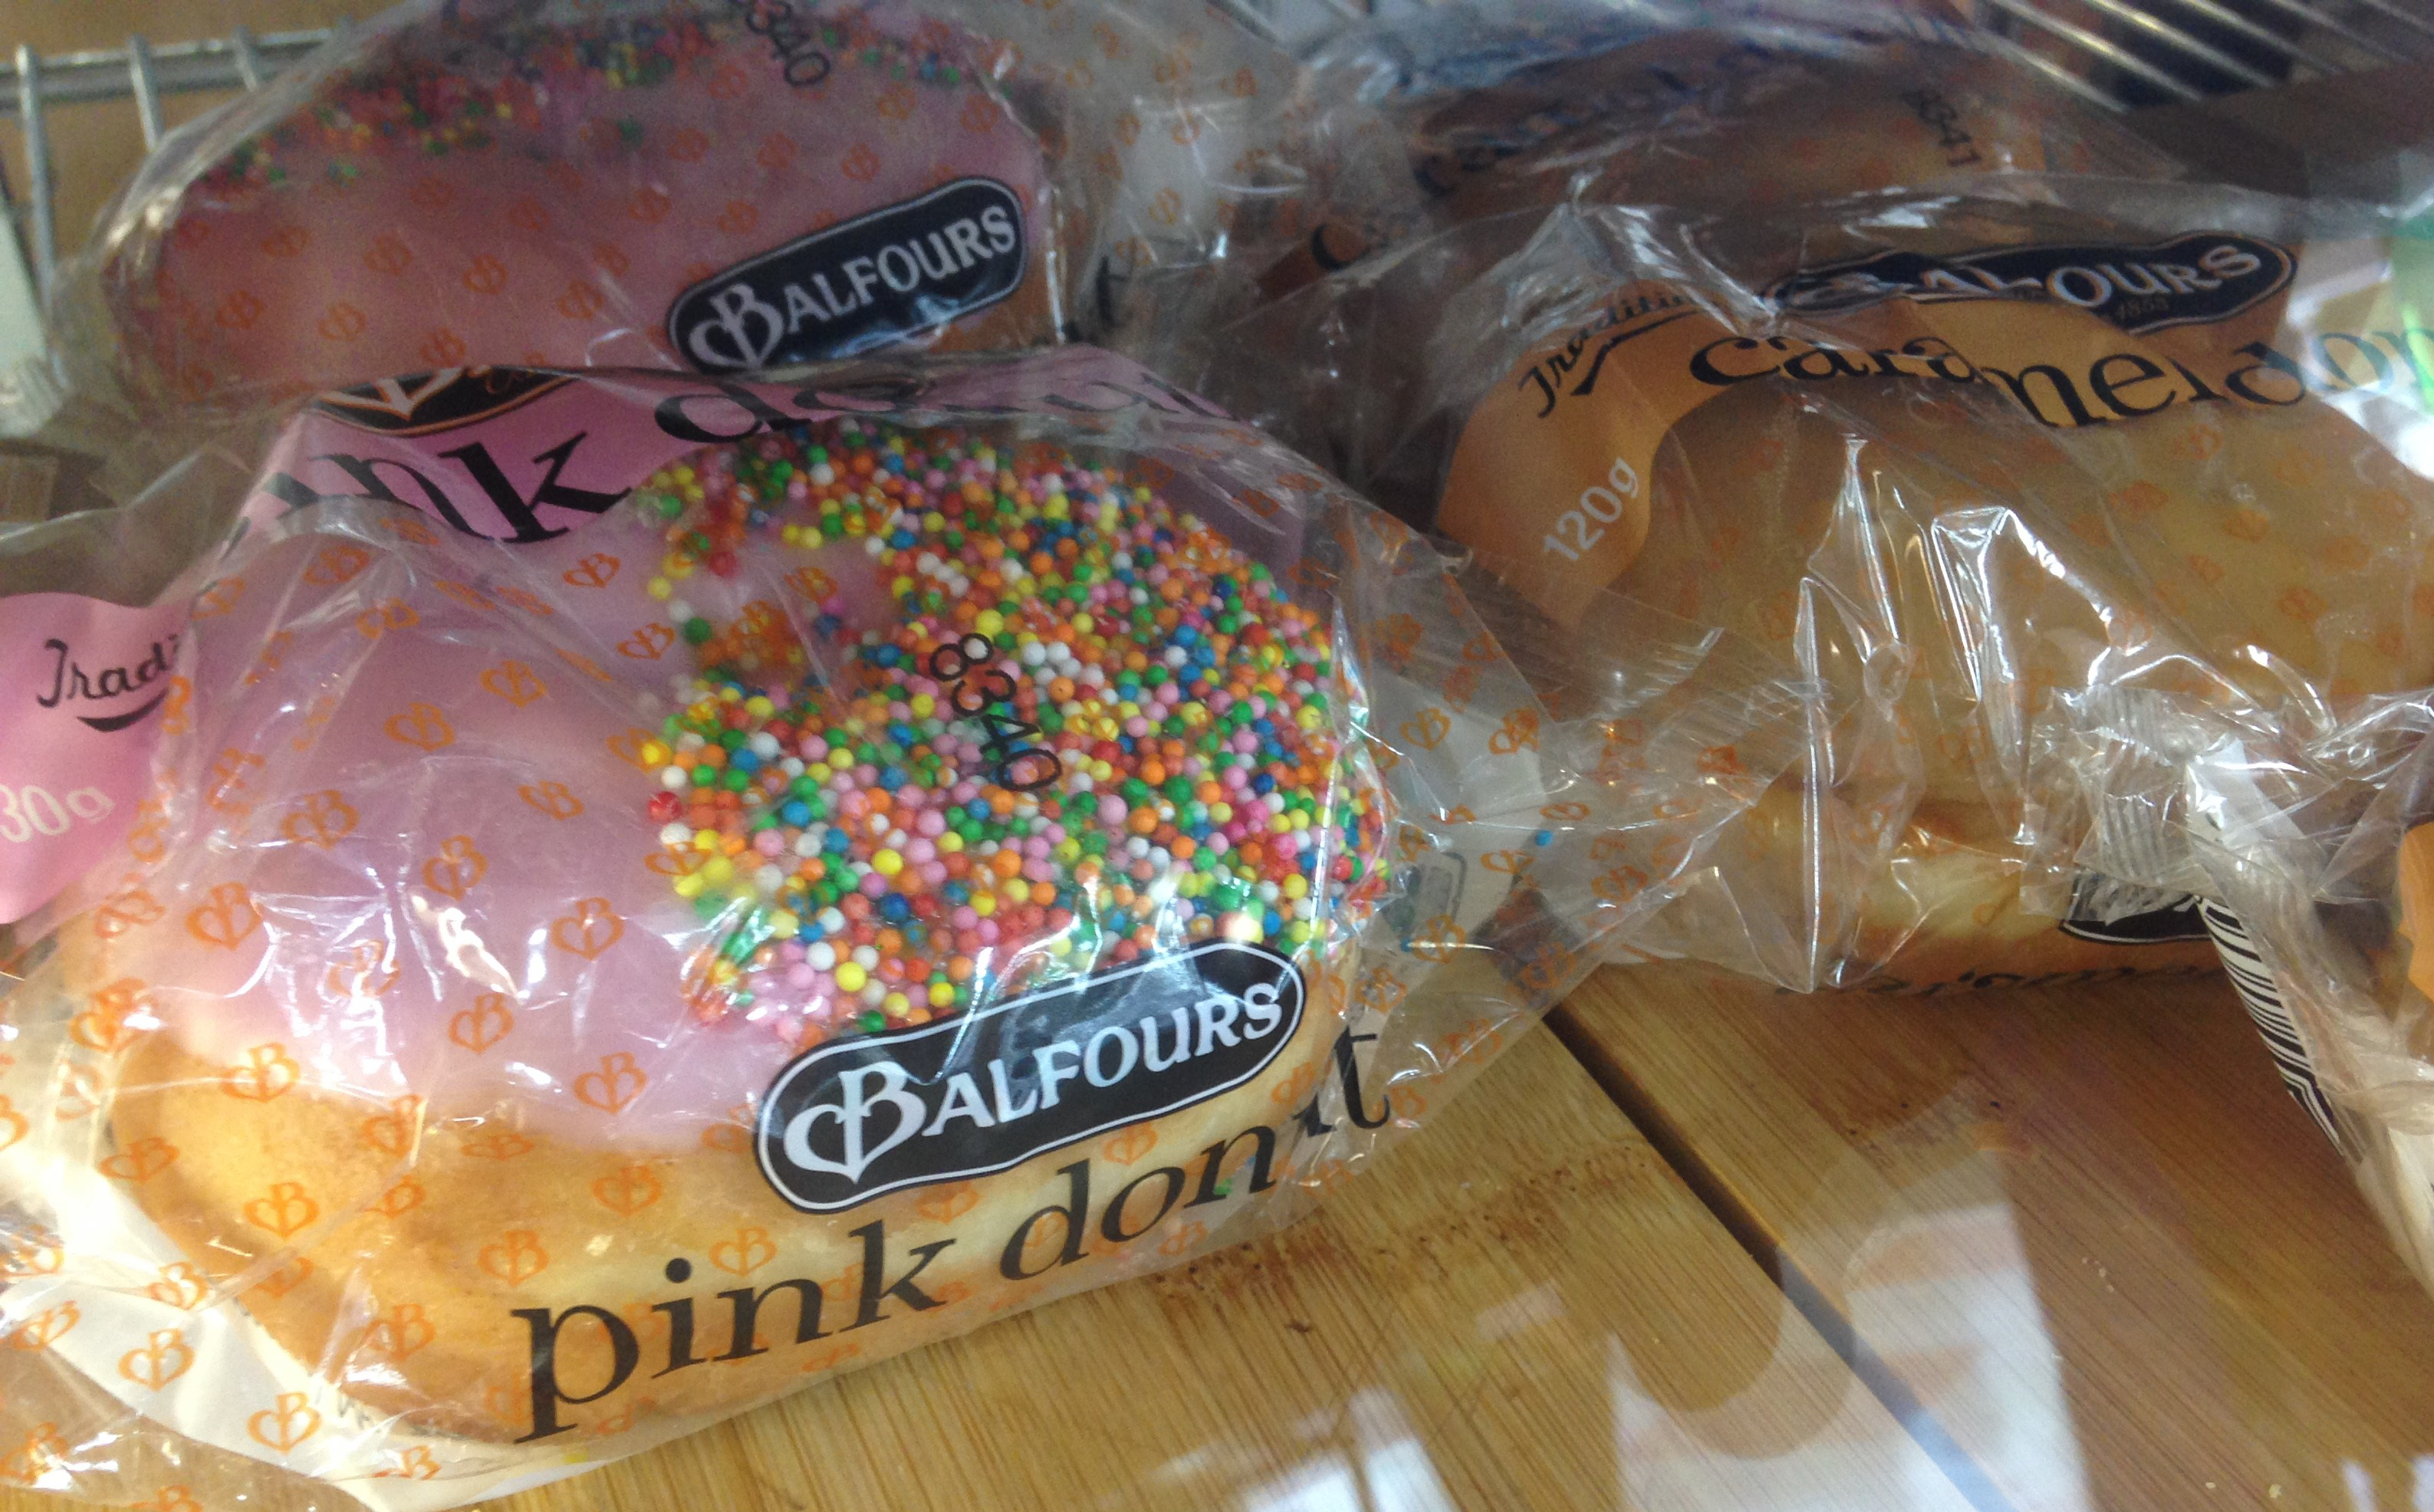 Balfour Doughnuts - pink